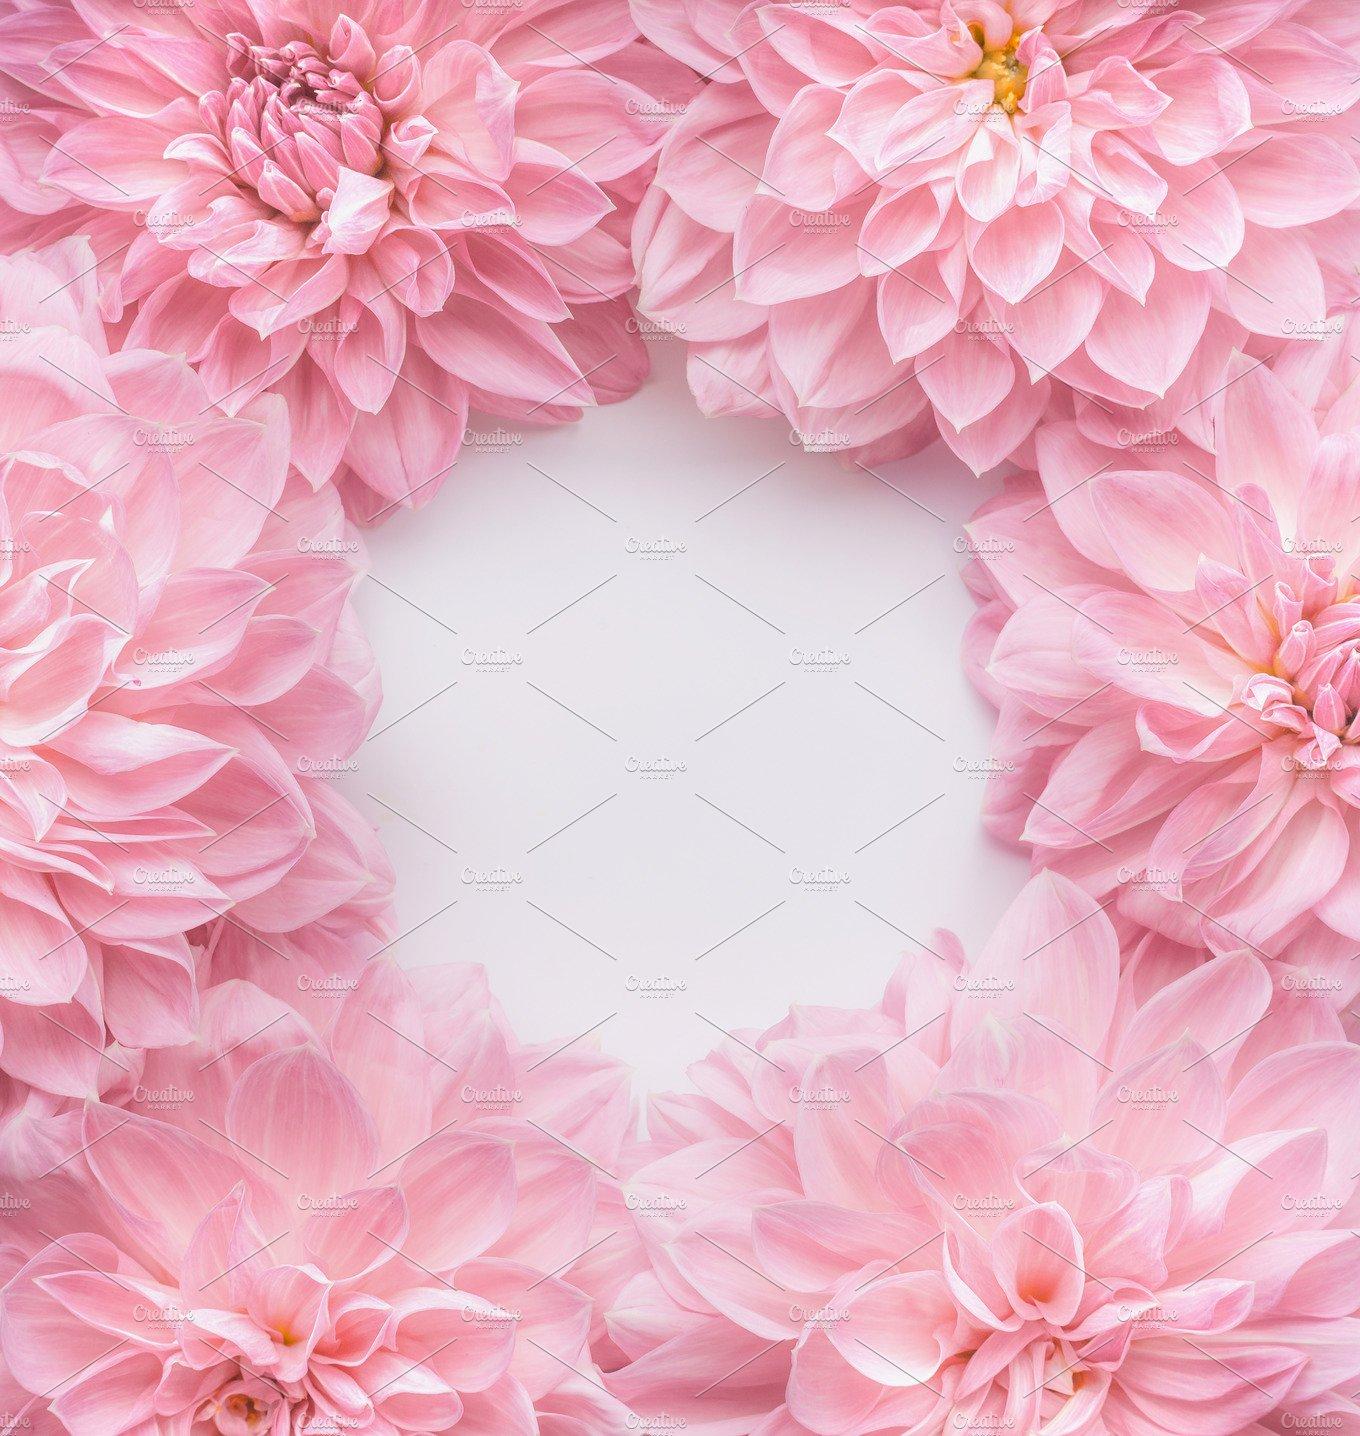 Creative Pastel Pink Flowers Frame Arts Entertainment Photos Market